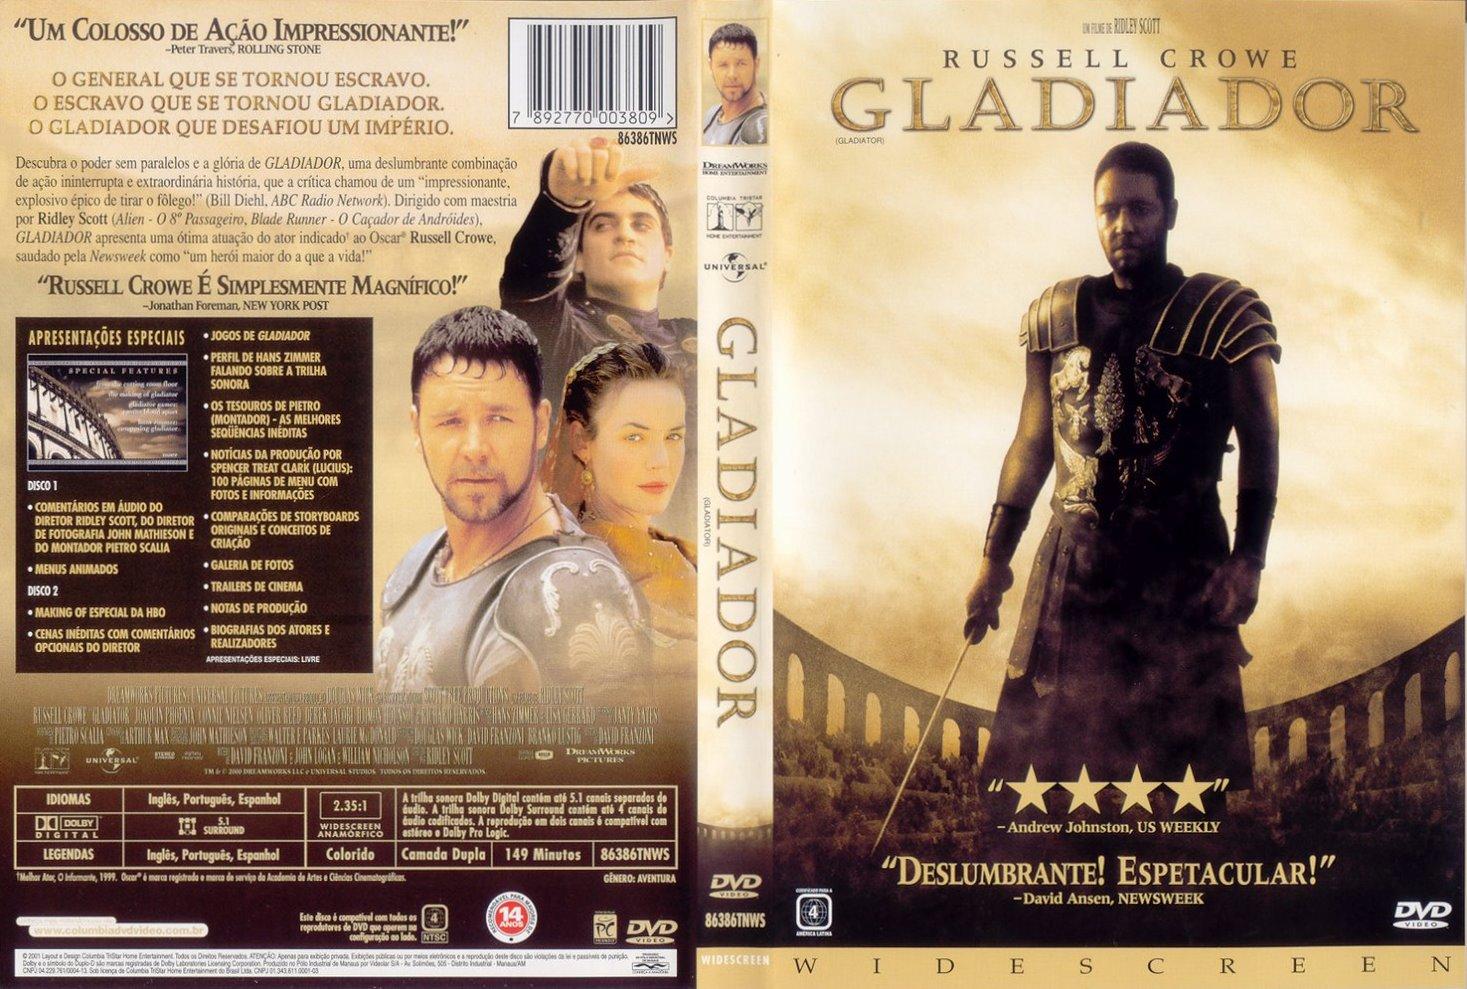 http://2.bp.blogspot.com/-vjpVxLgpJnI/T5BUnQkEZkI/AAAAAAAAAS0/bhj8oDlZ7j8/s1600/Gladiador.jpg